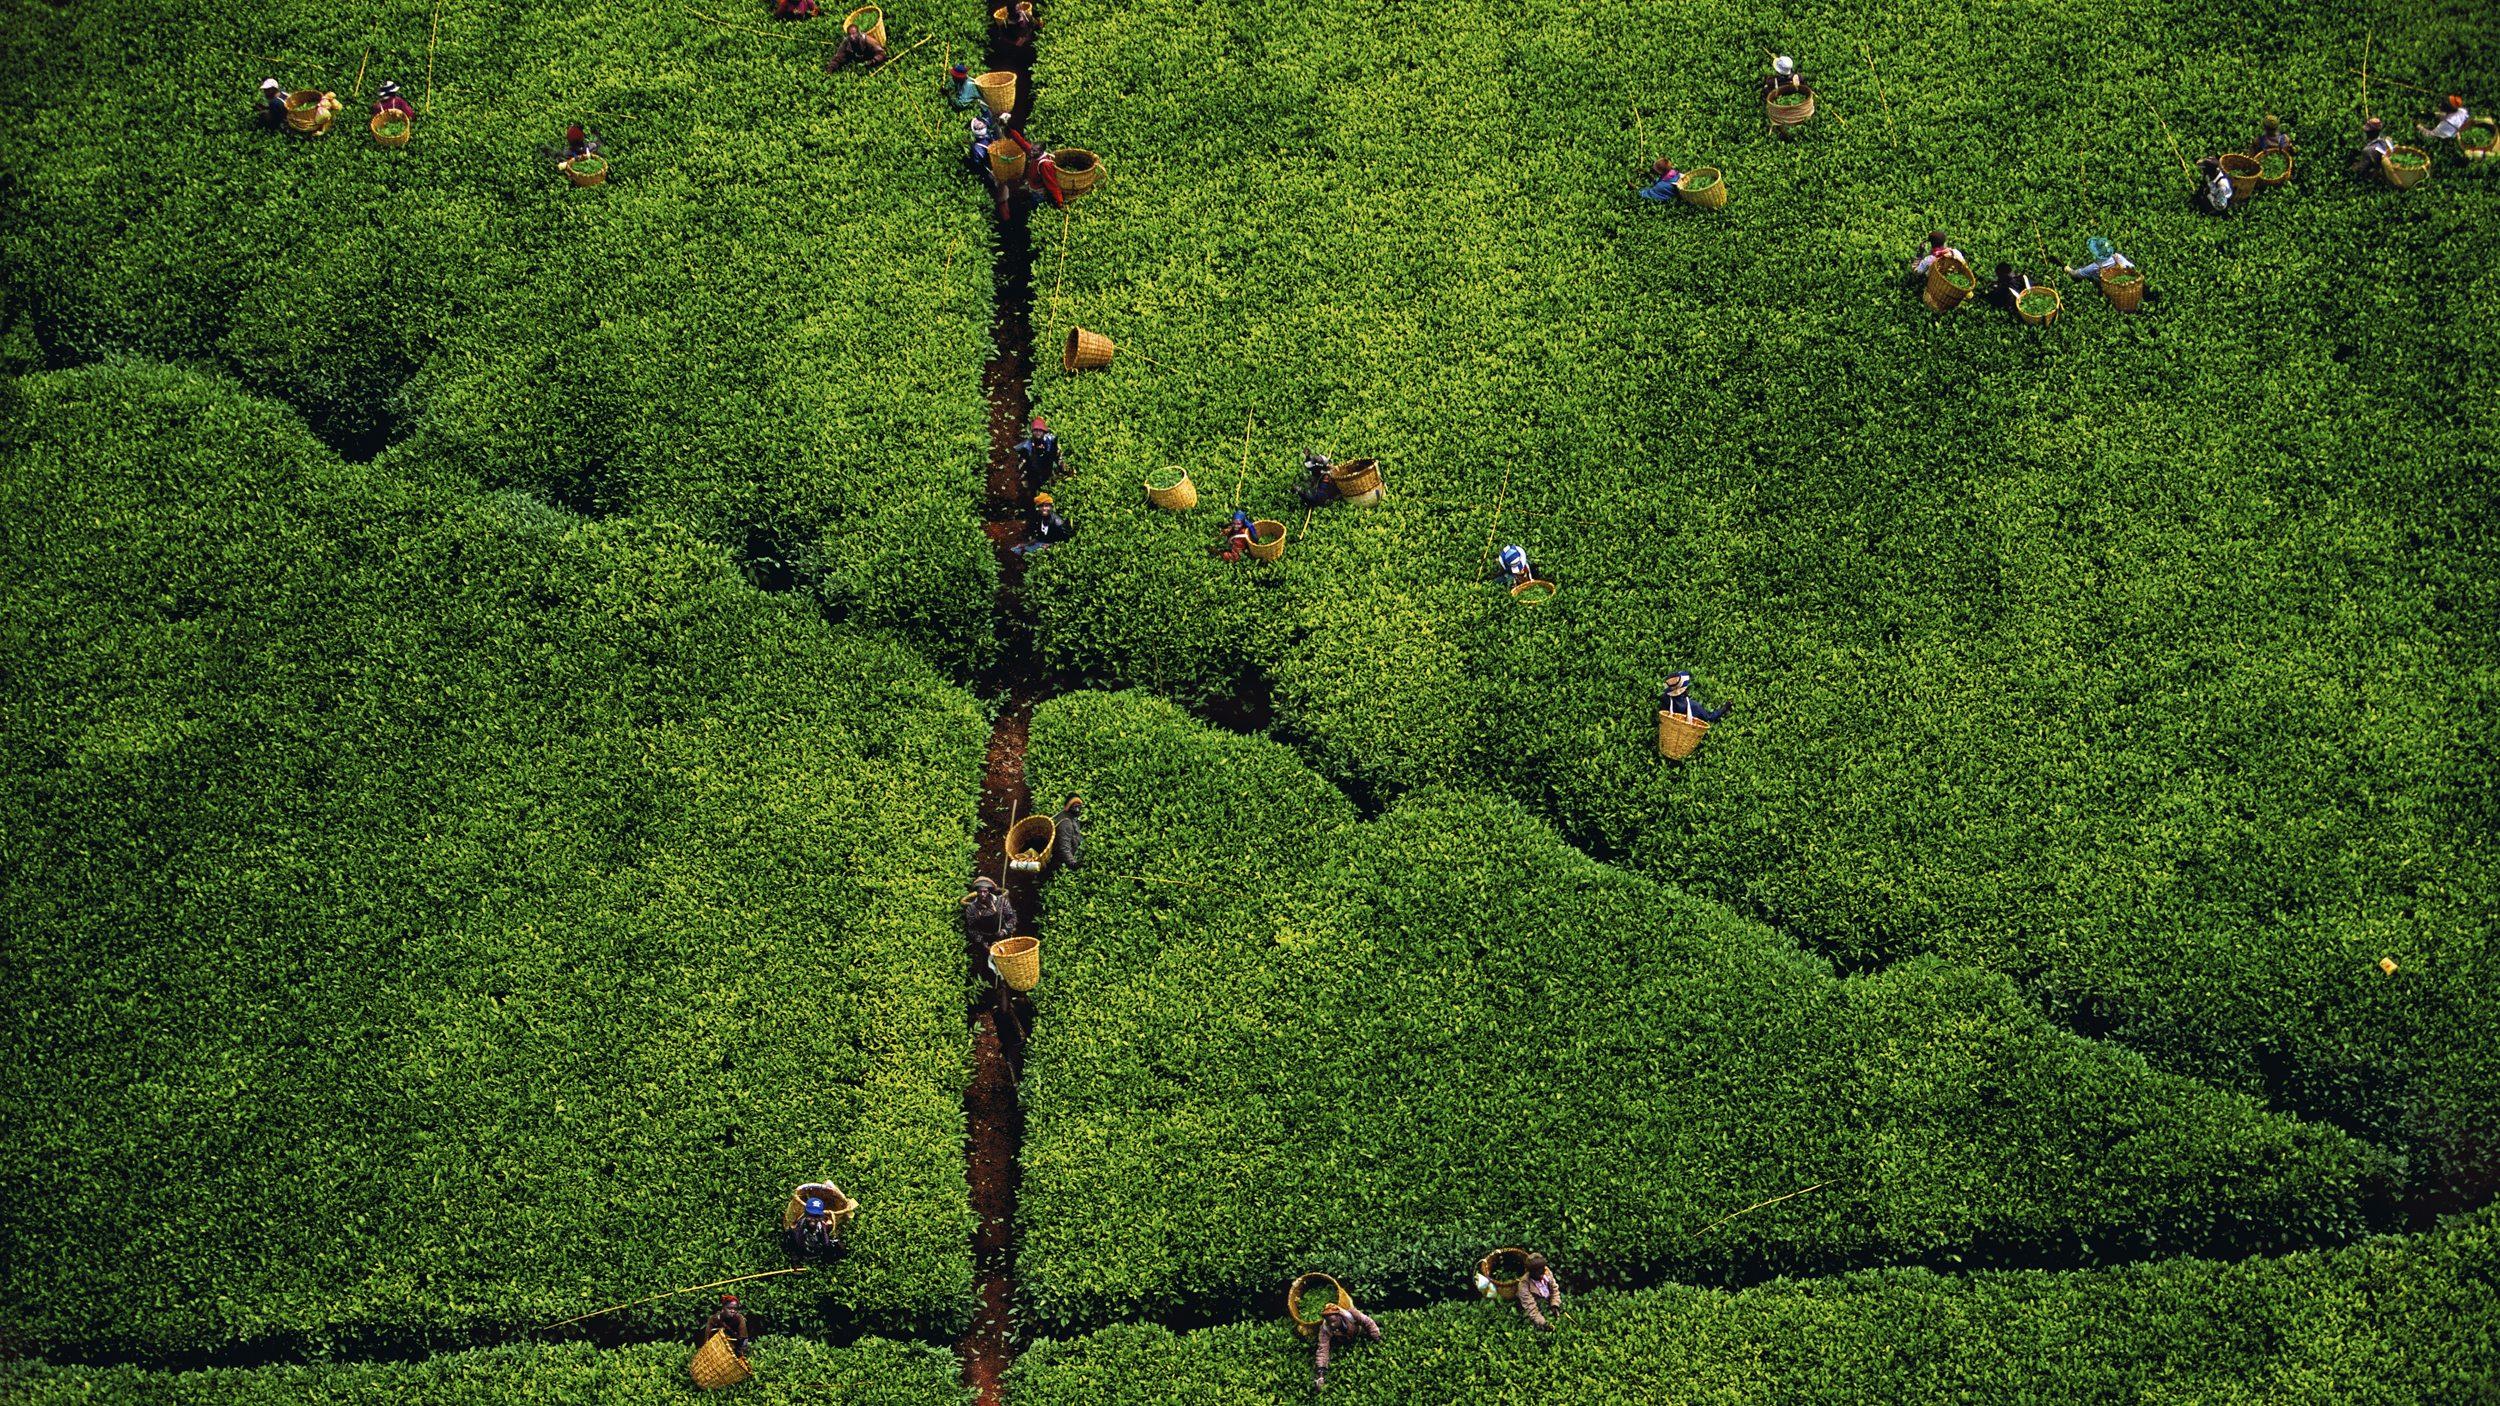 Tea picking, Kericho region, Kenya